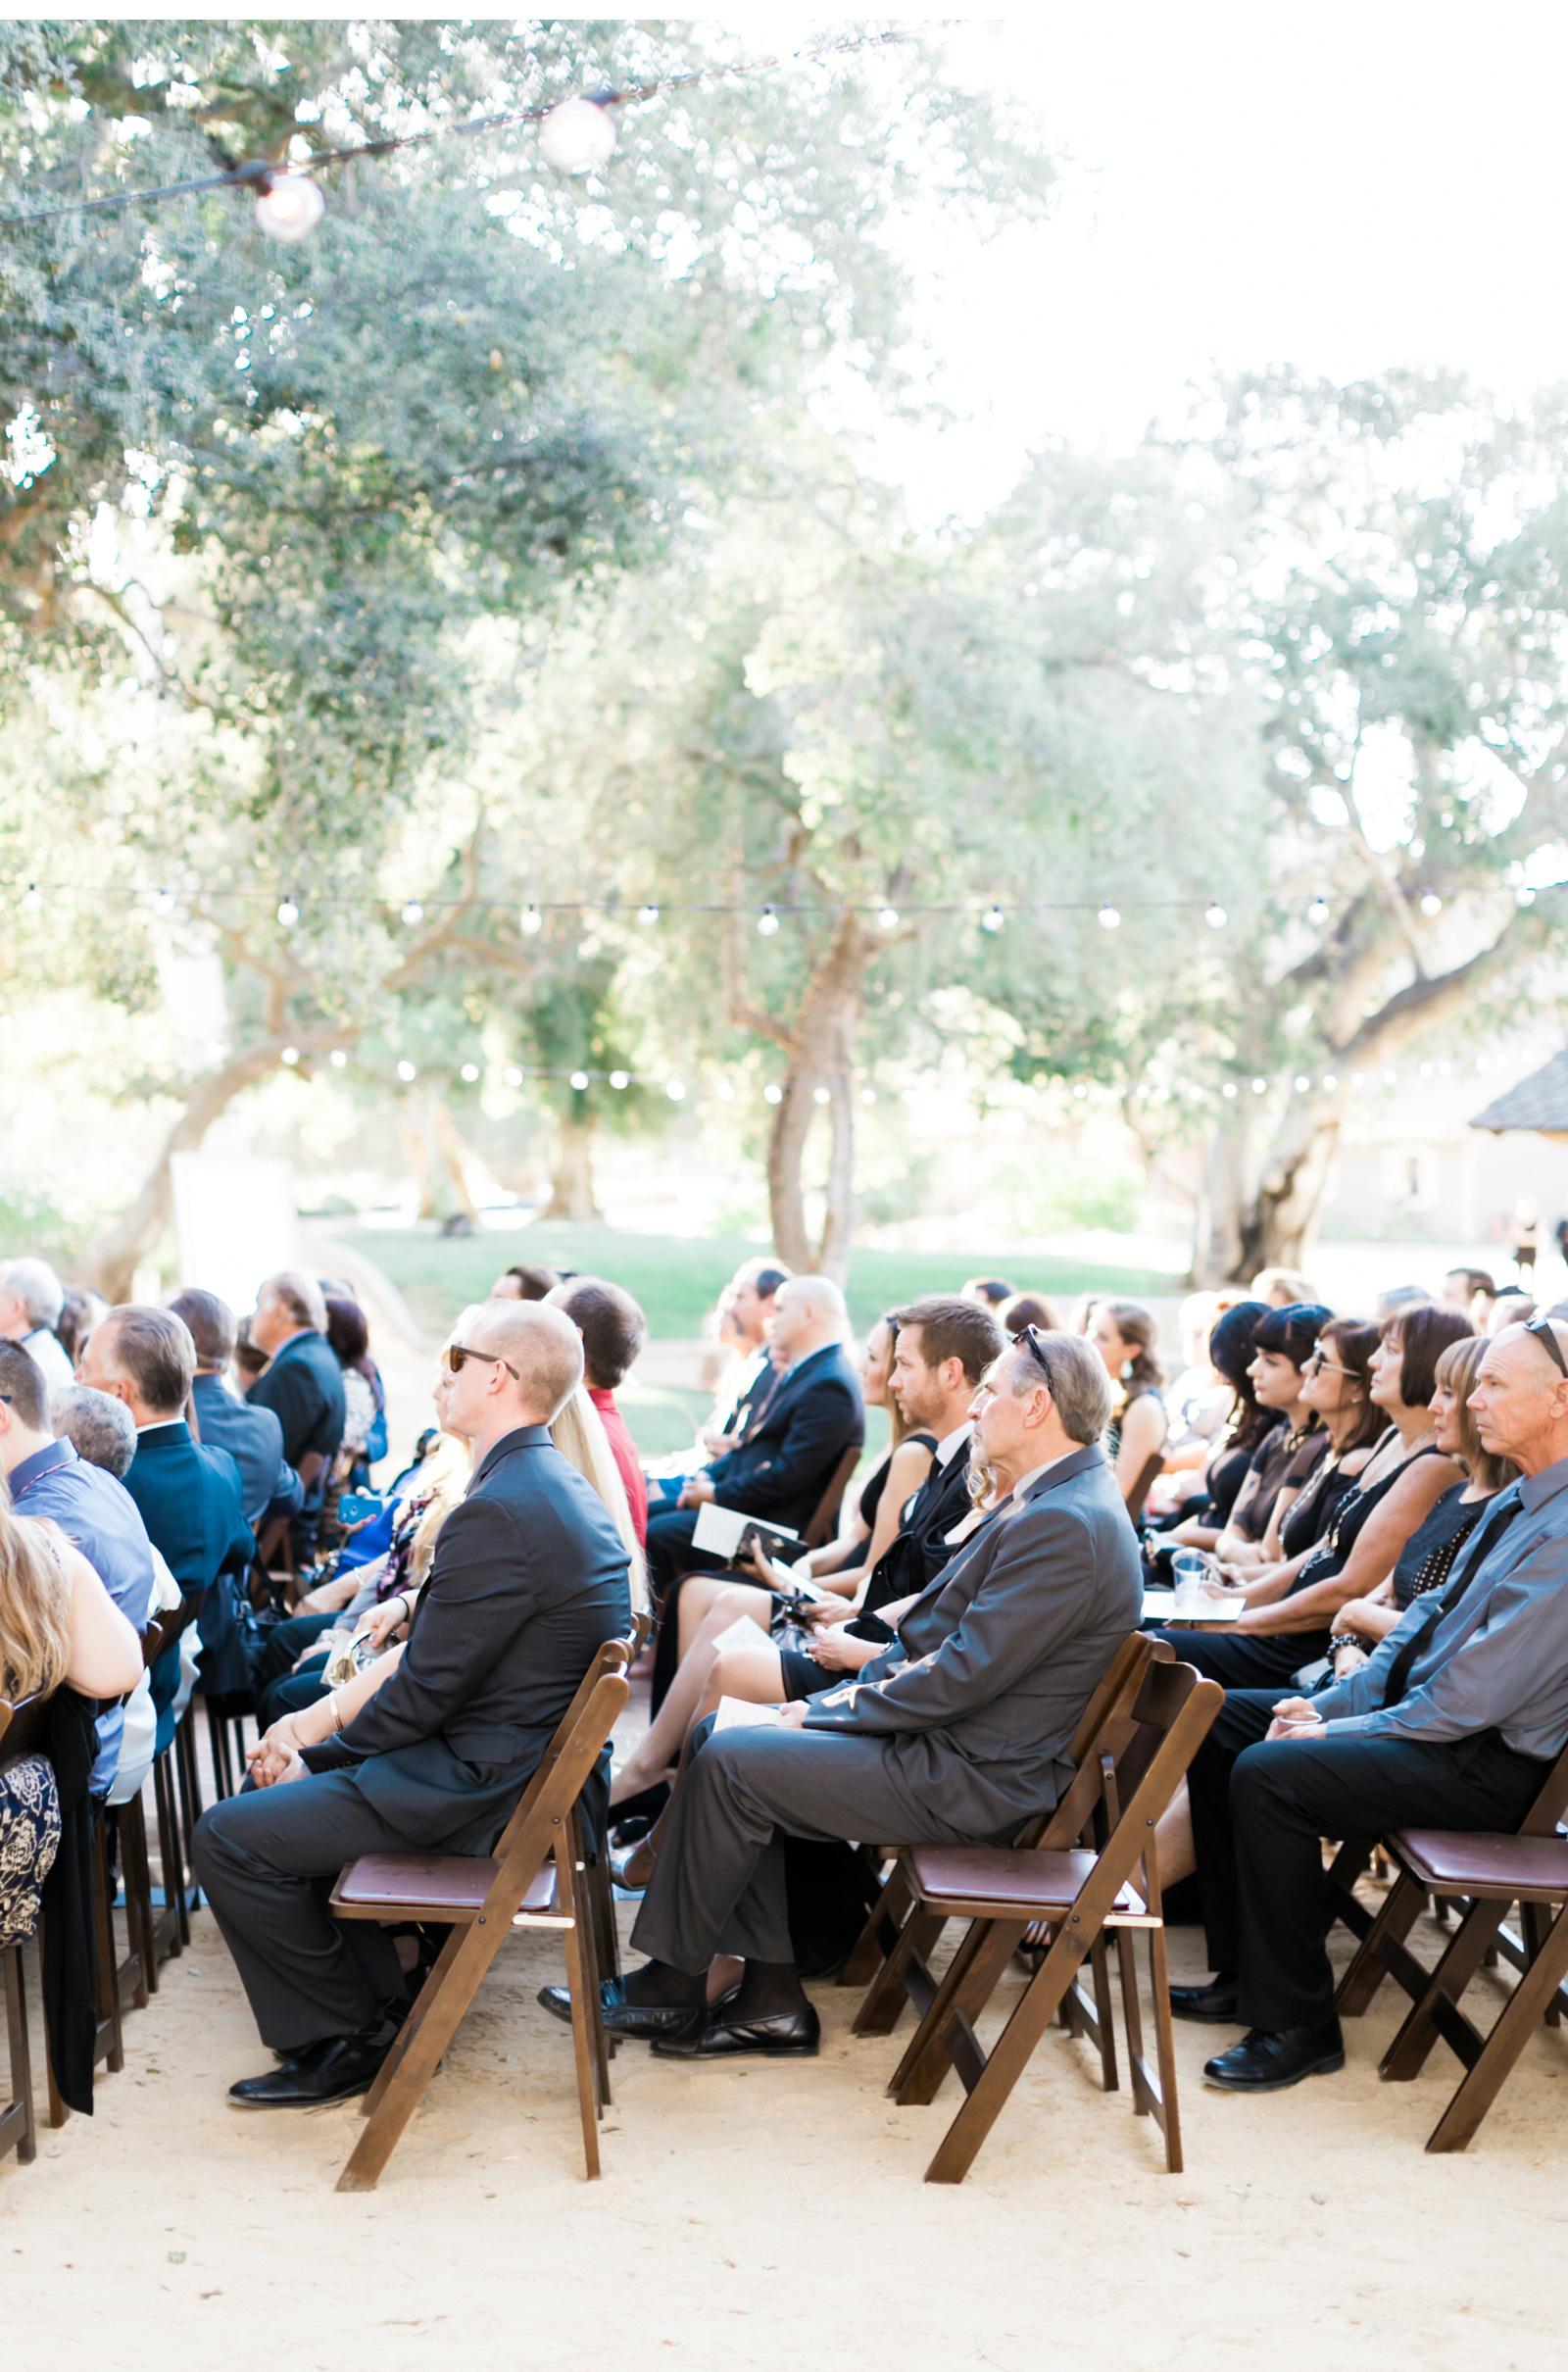 Style-Me-Pretty-Wedding-Photographer-Natalie-Schutt-Photography-Calfornia-San-Luis-Obispo_02.jpg